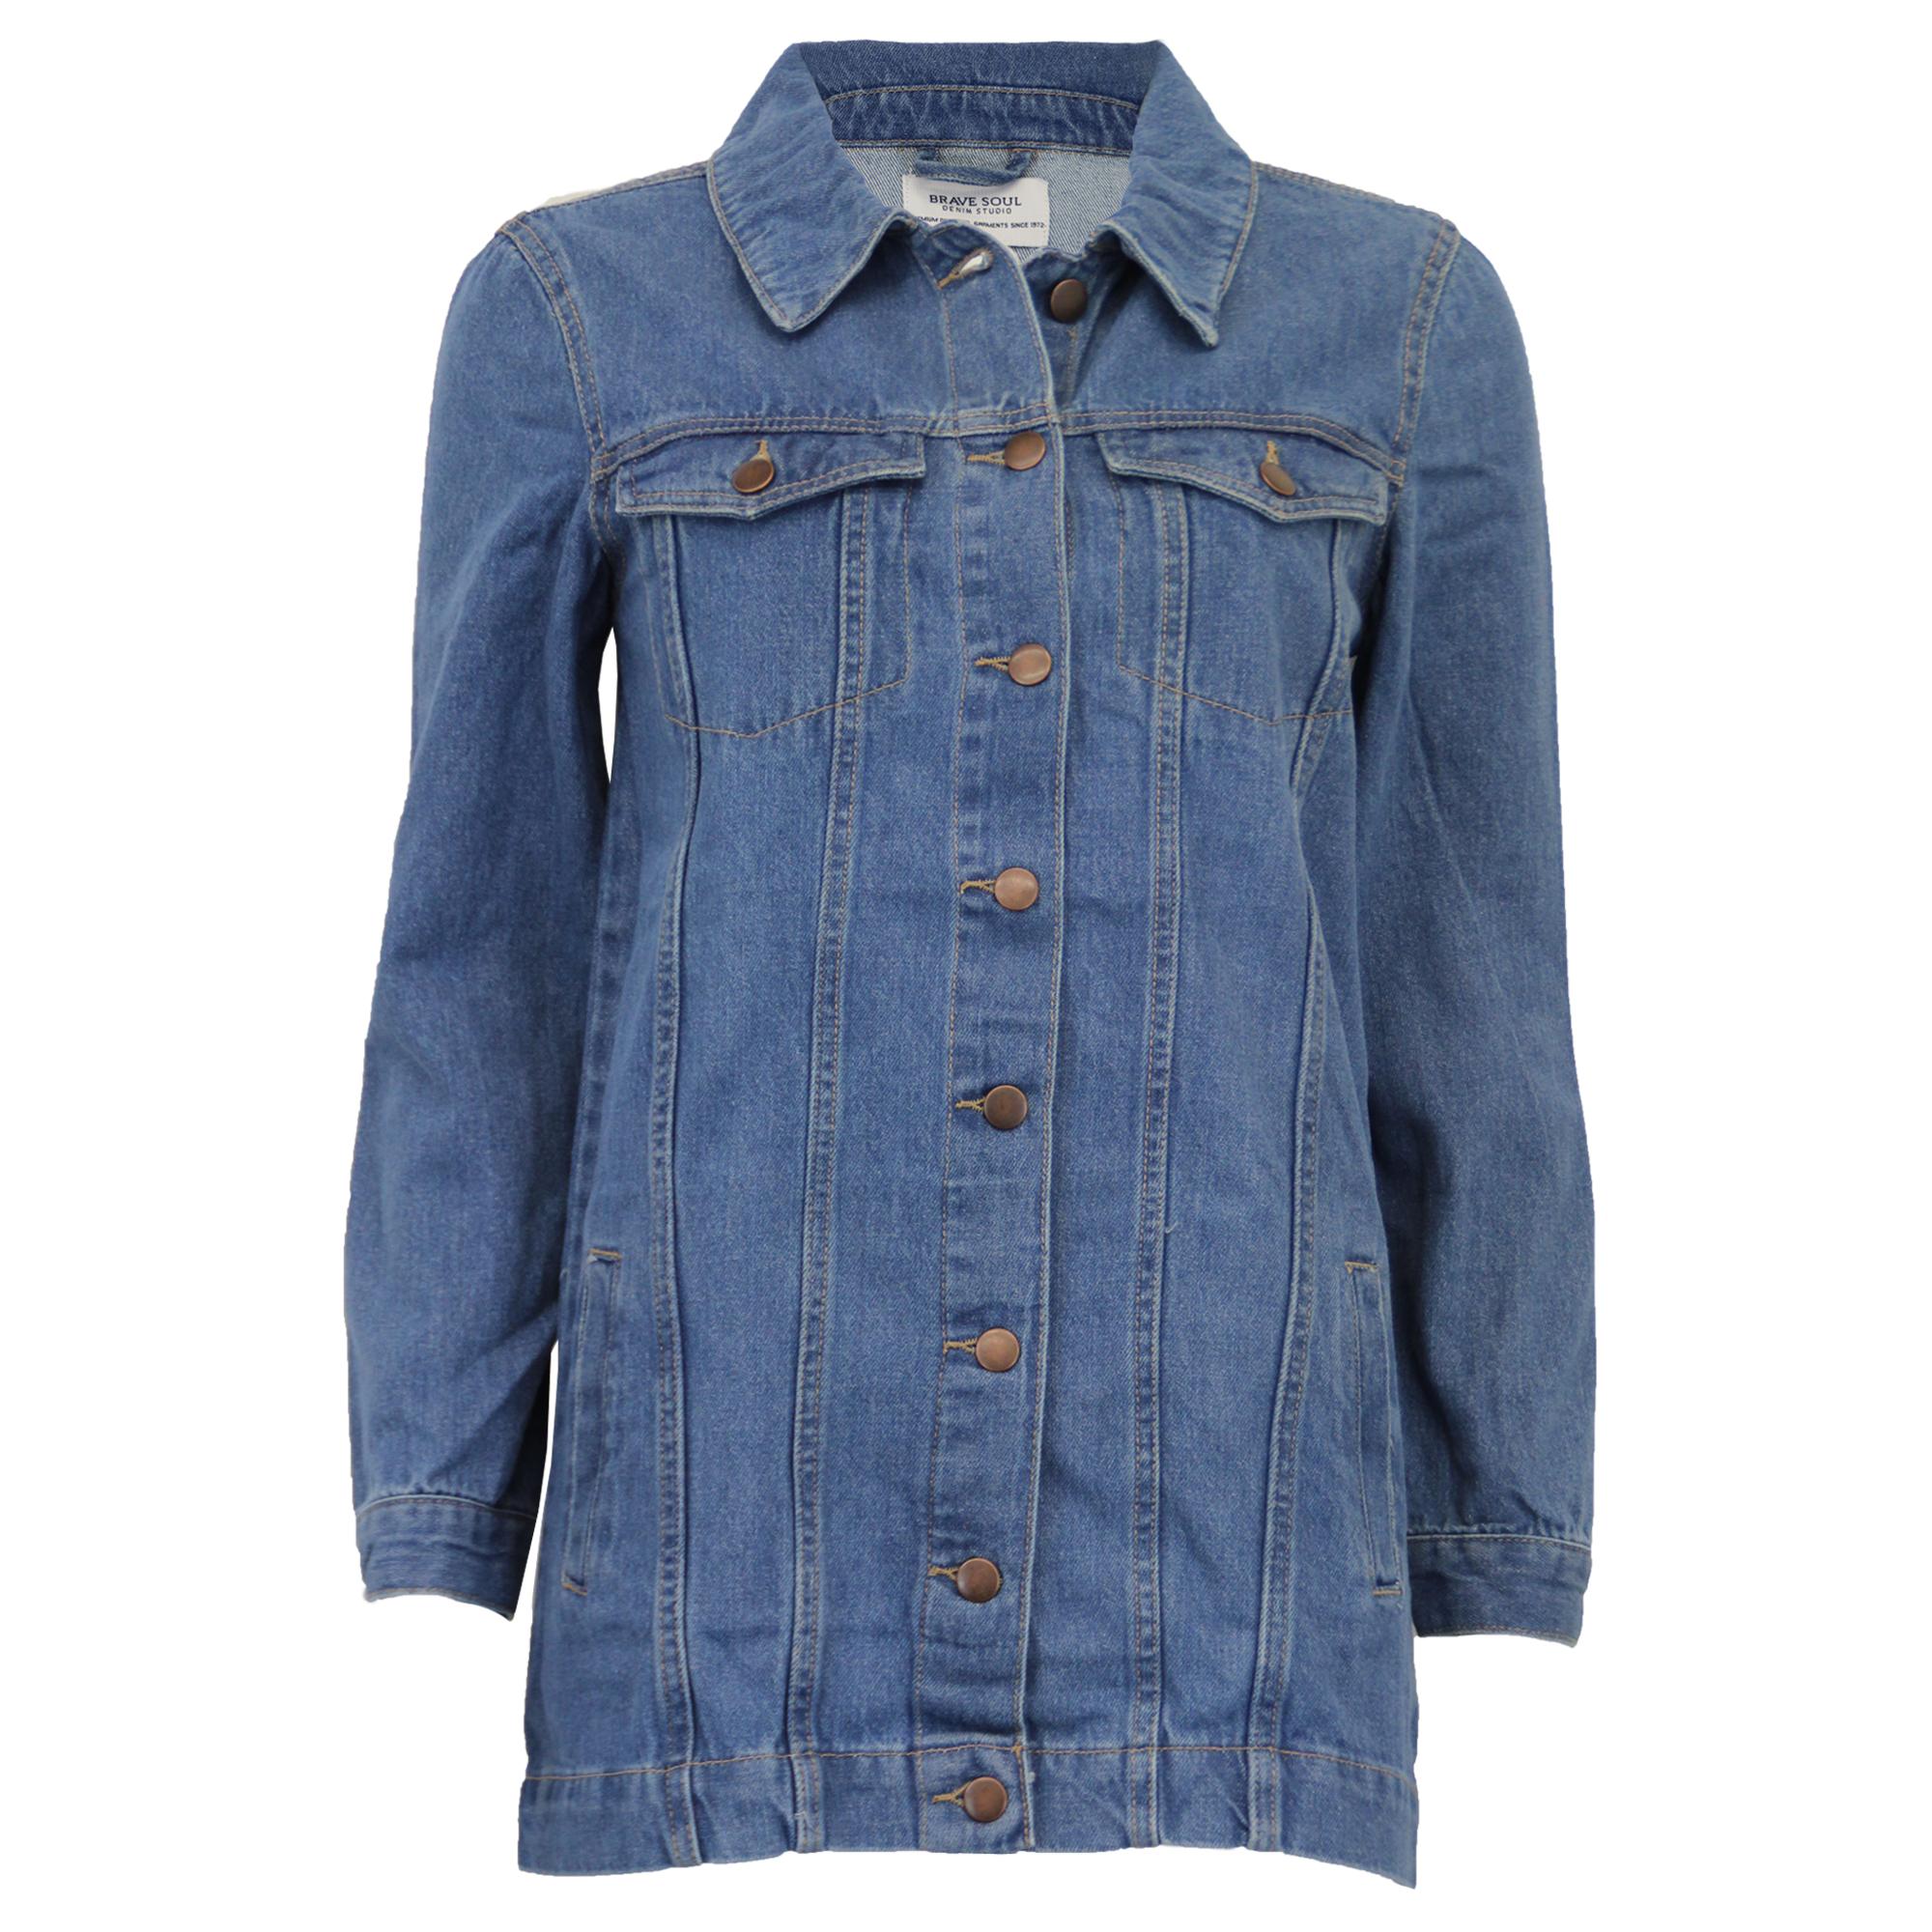 Lungo da Donna Western Giacca di Jeans Brave Soul   Acer  Cotone con ... aaa622571b9